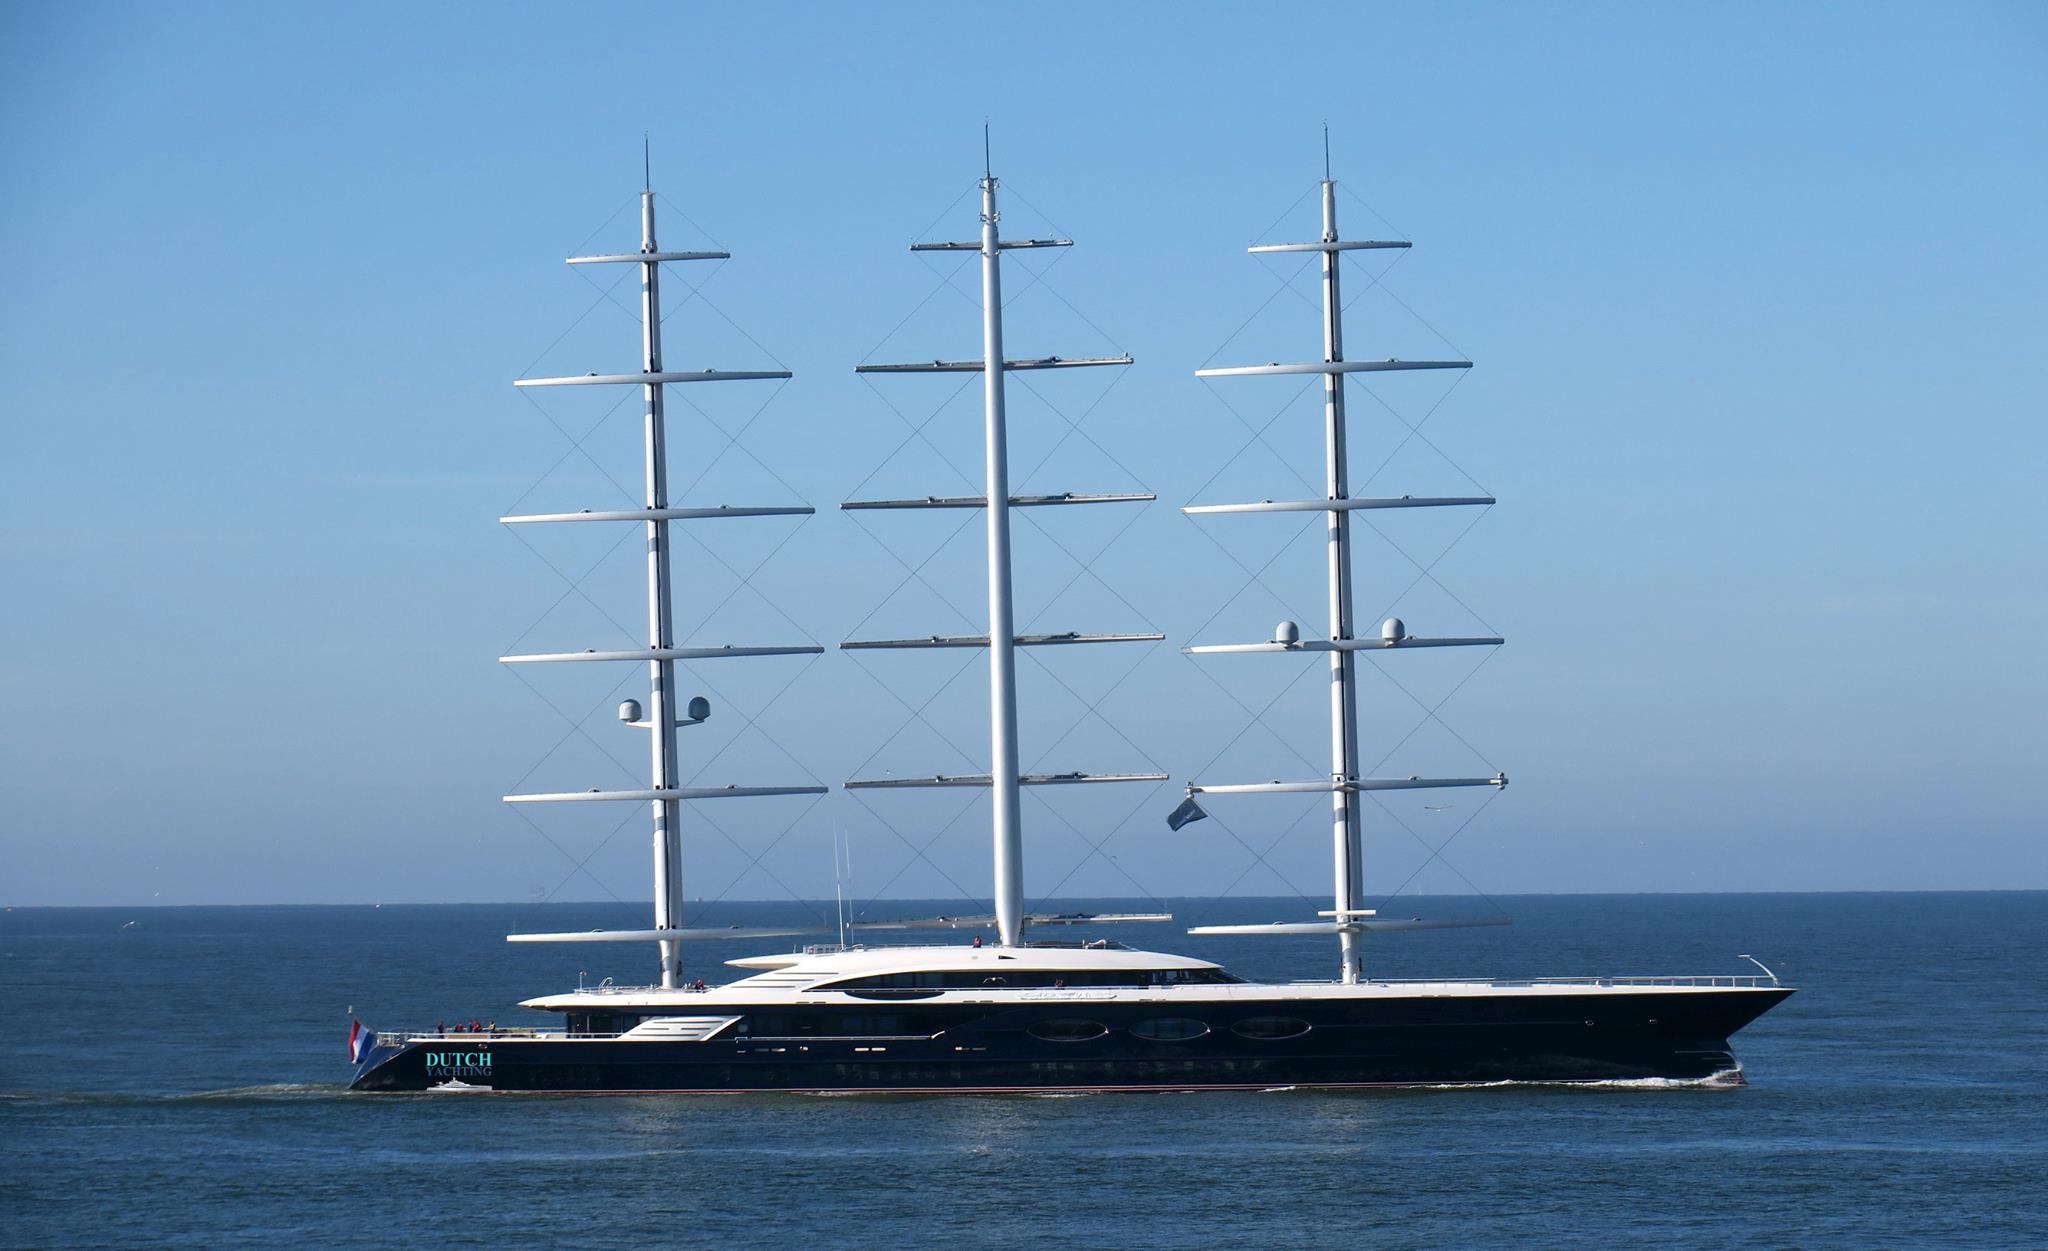 Legendary sailing superyacht Black Pearl docked in Saint